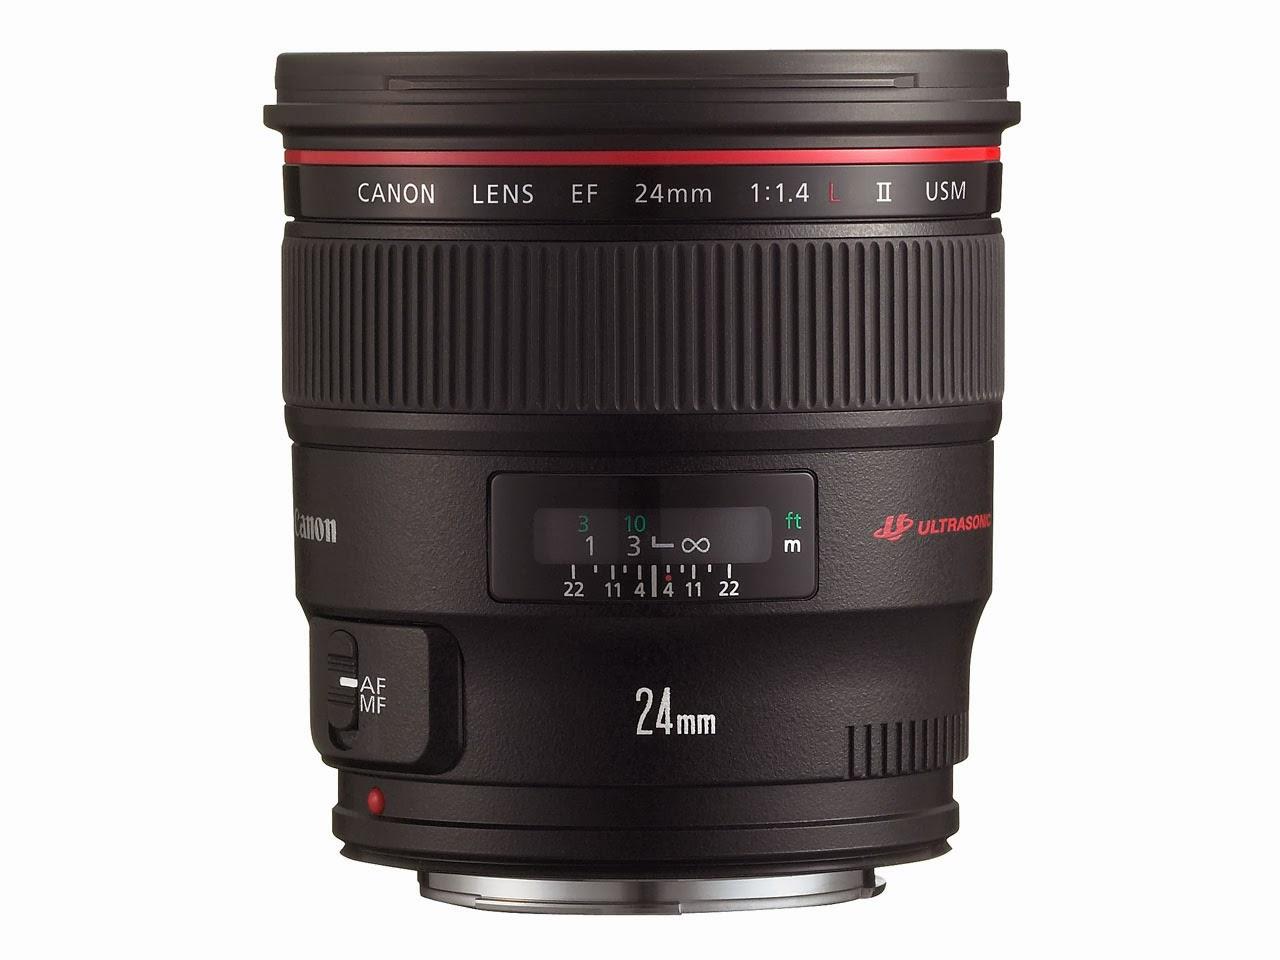 Harga Lensa Canon EF 24mm f/1.4L II USM, Canon L-Series